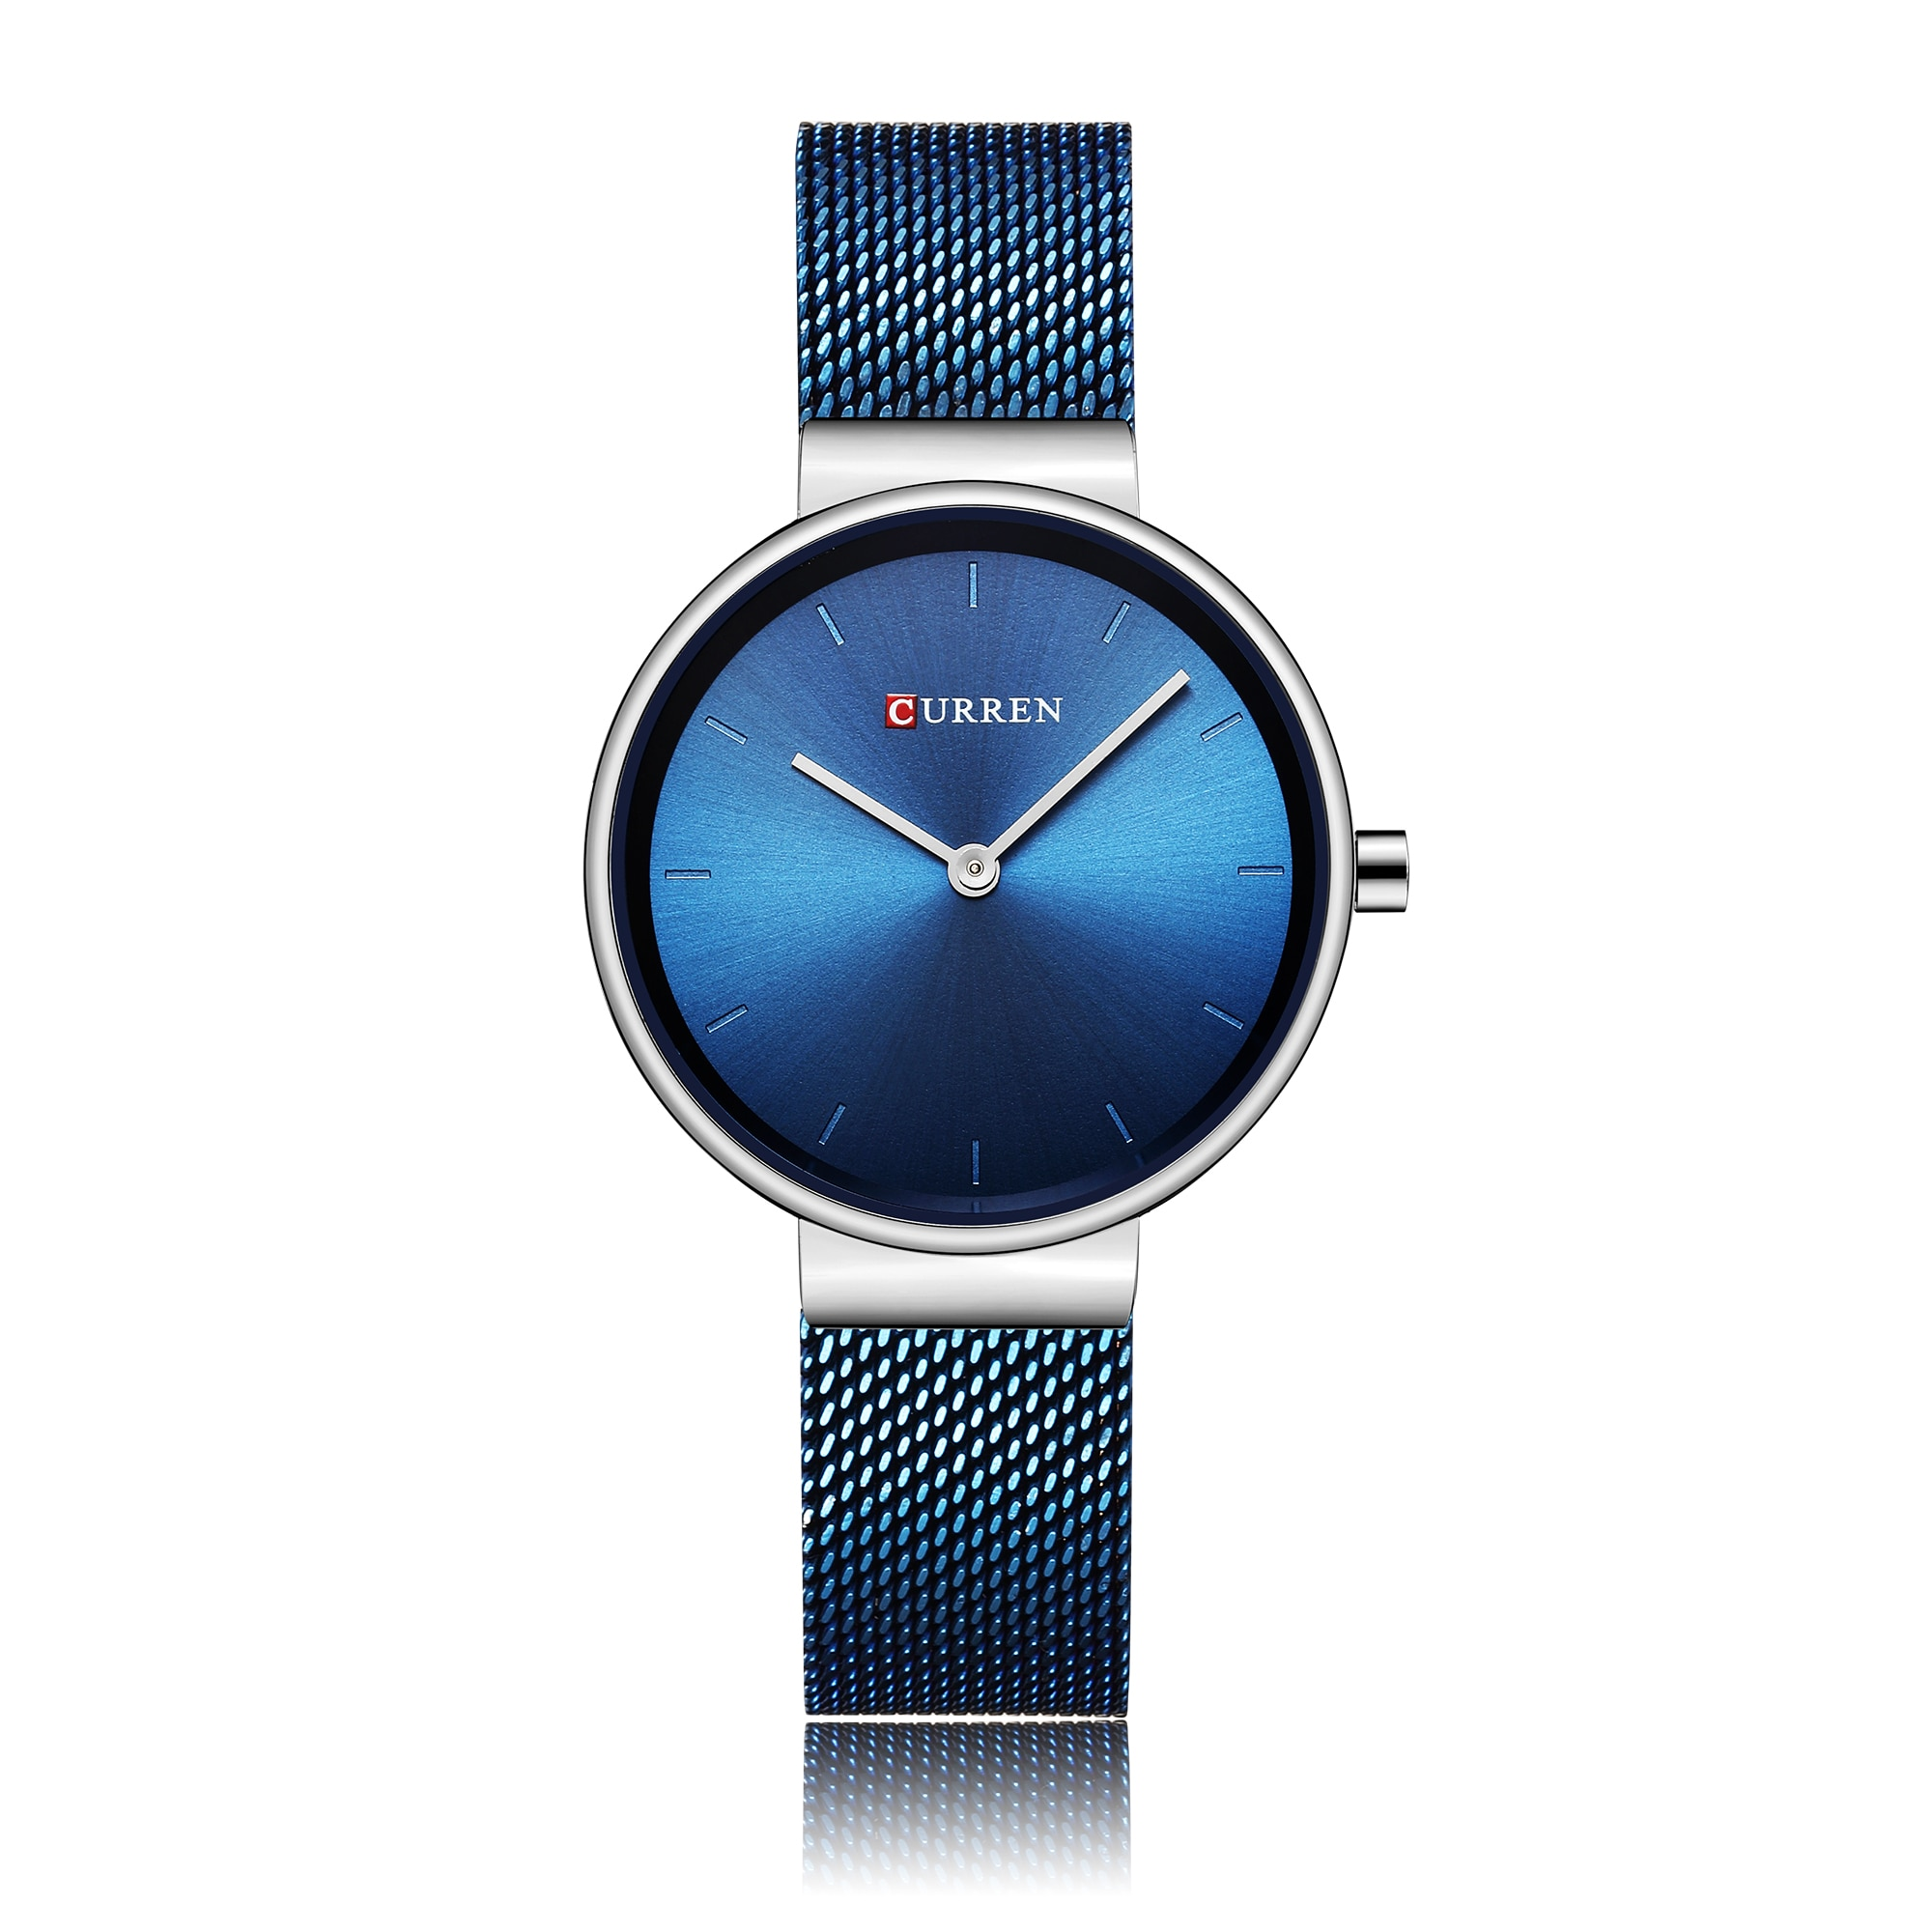 CURREN Women Watch Simplicity Modern Quartz Wrist Watch Blue Stainless Steel Waterproof Elegant Reloj Mujer Valentine's Day Gift enlarge